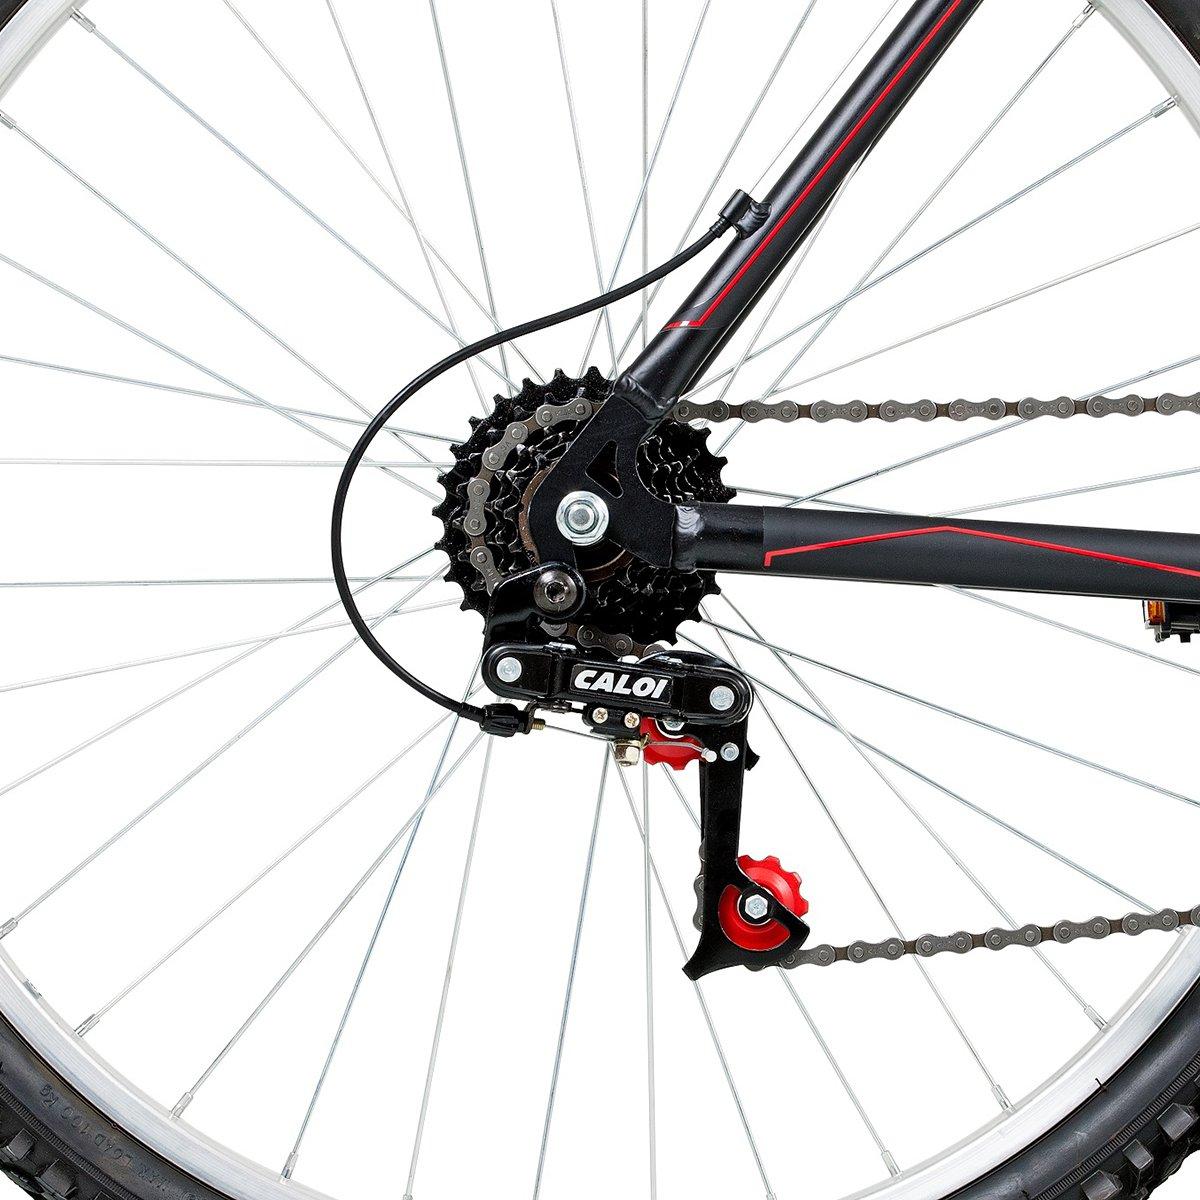 ... Bicicleta Caloi Aluminum Sport - Aro 26 - 21 Marchas - Alumínio ... 135b38c764e37